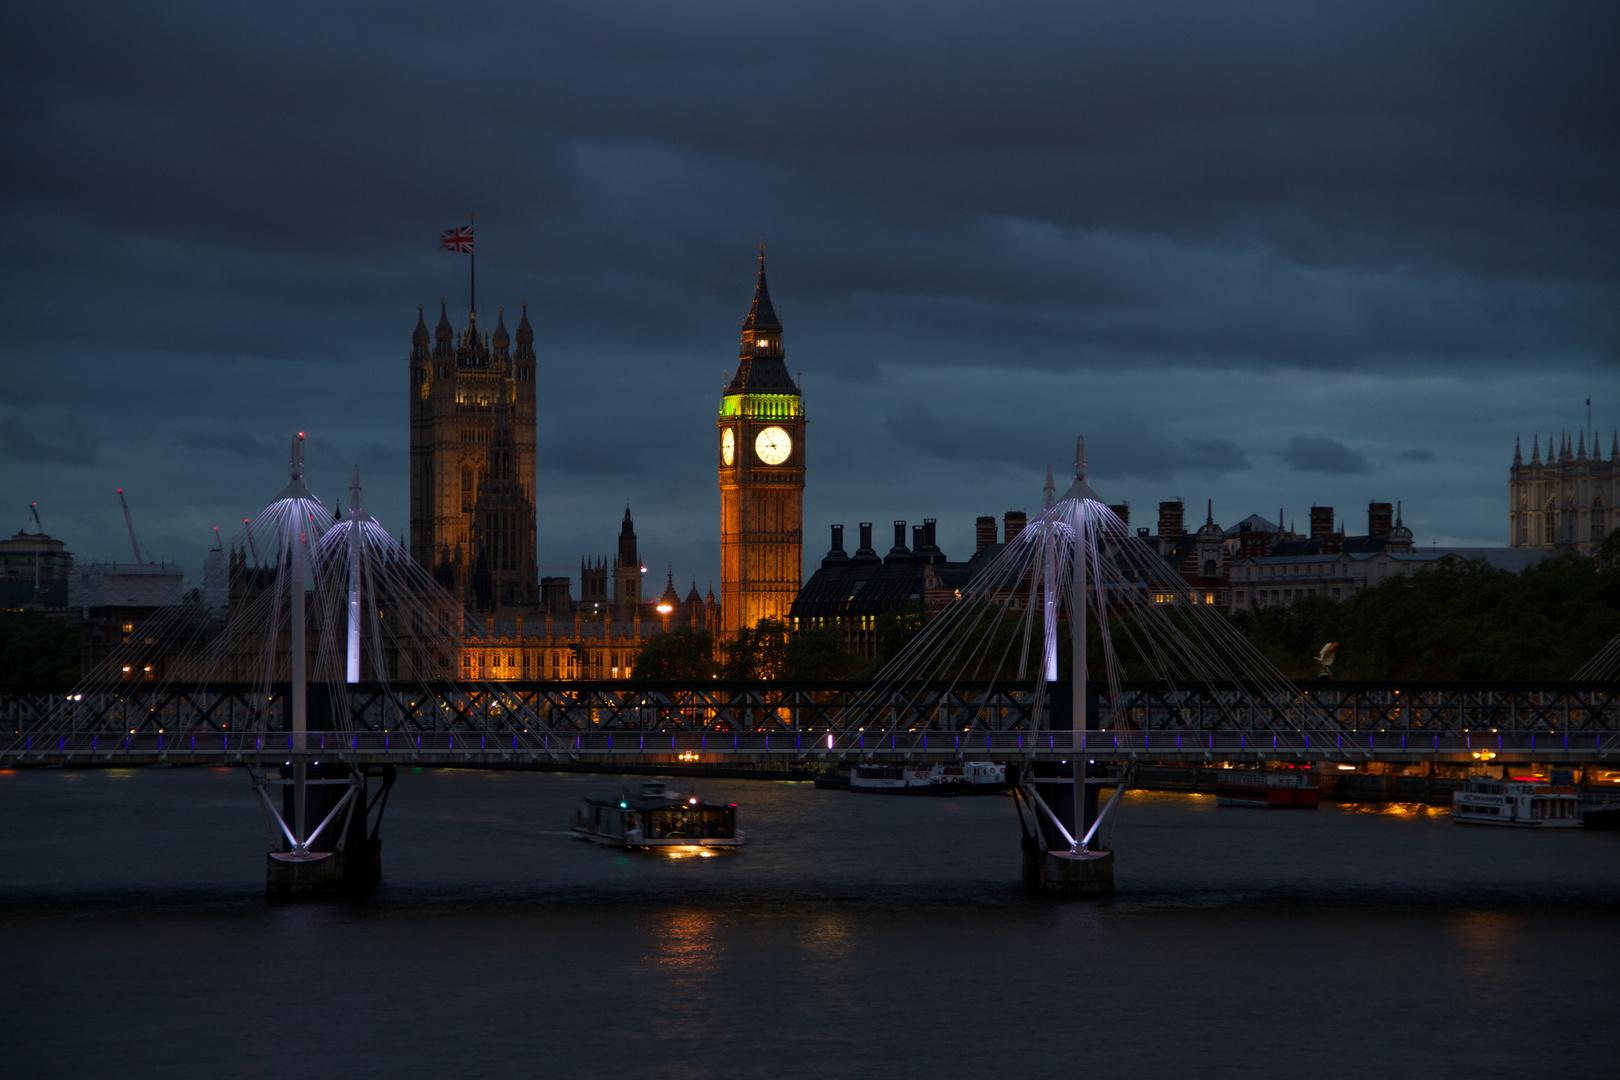 London@nigth